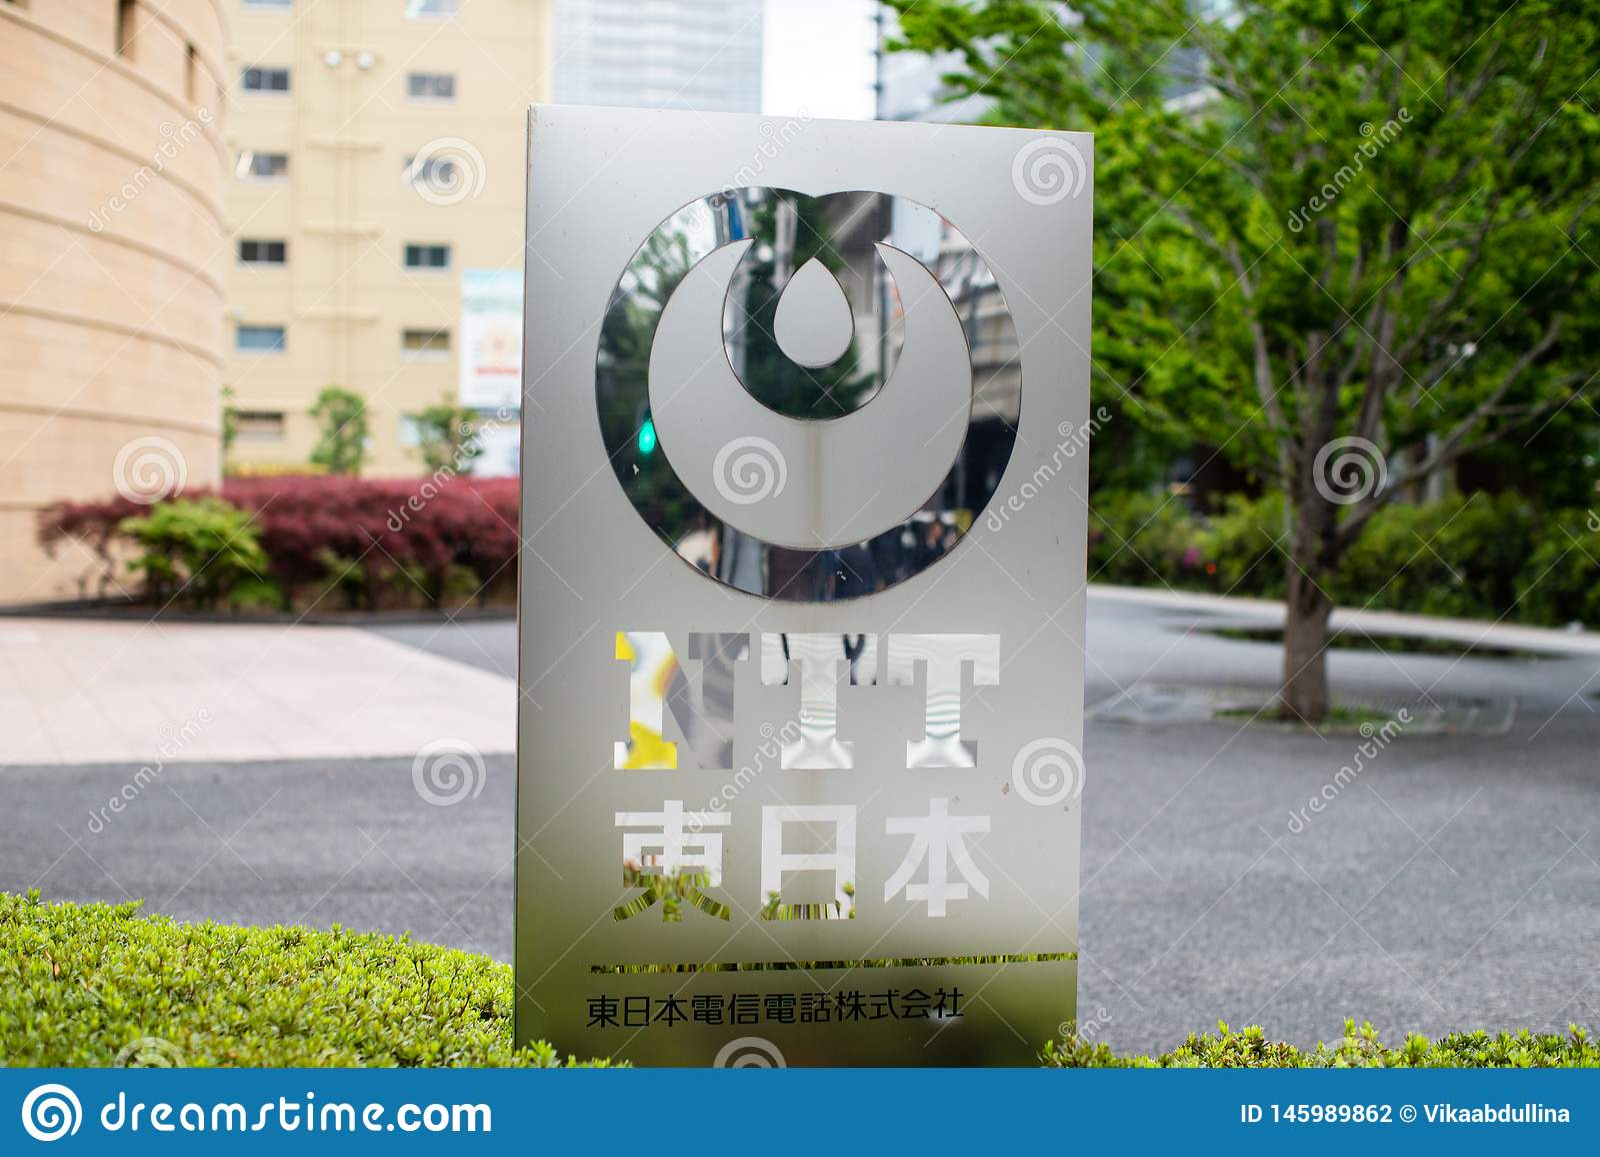 Nippon τηλέγραφος και τηλέφωνο - NTT το λογότυπο, αυτό είναι μια ιαπωνική επιχείρηση τηλεπικοινωνιών με κεντρικά γραφεία στο Τόκι